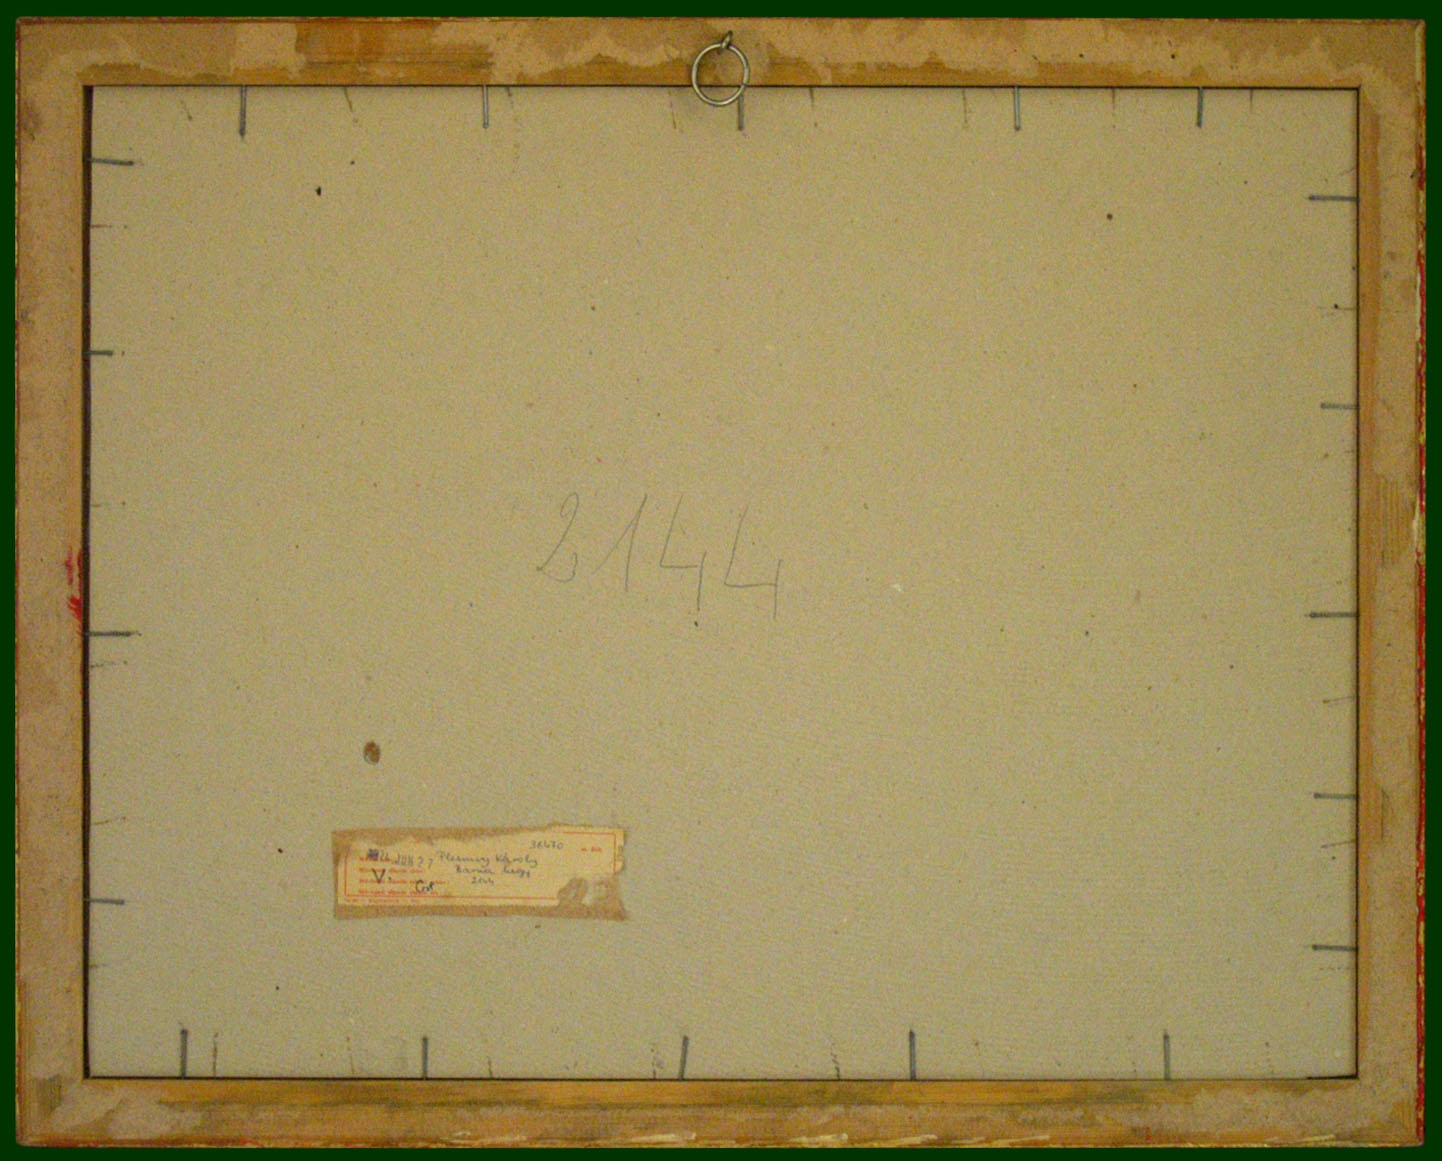 006-011hat.JPG (1442×1161)